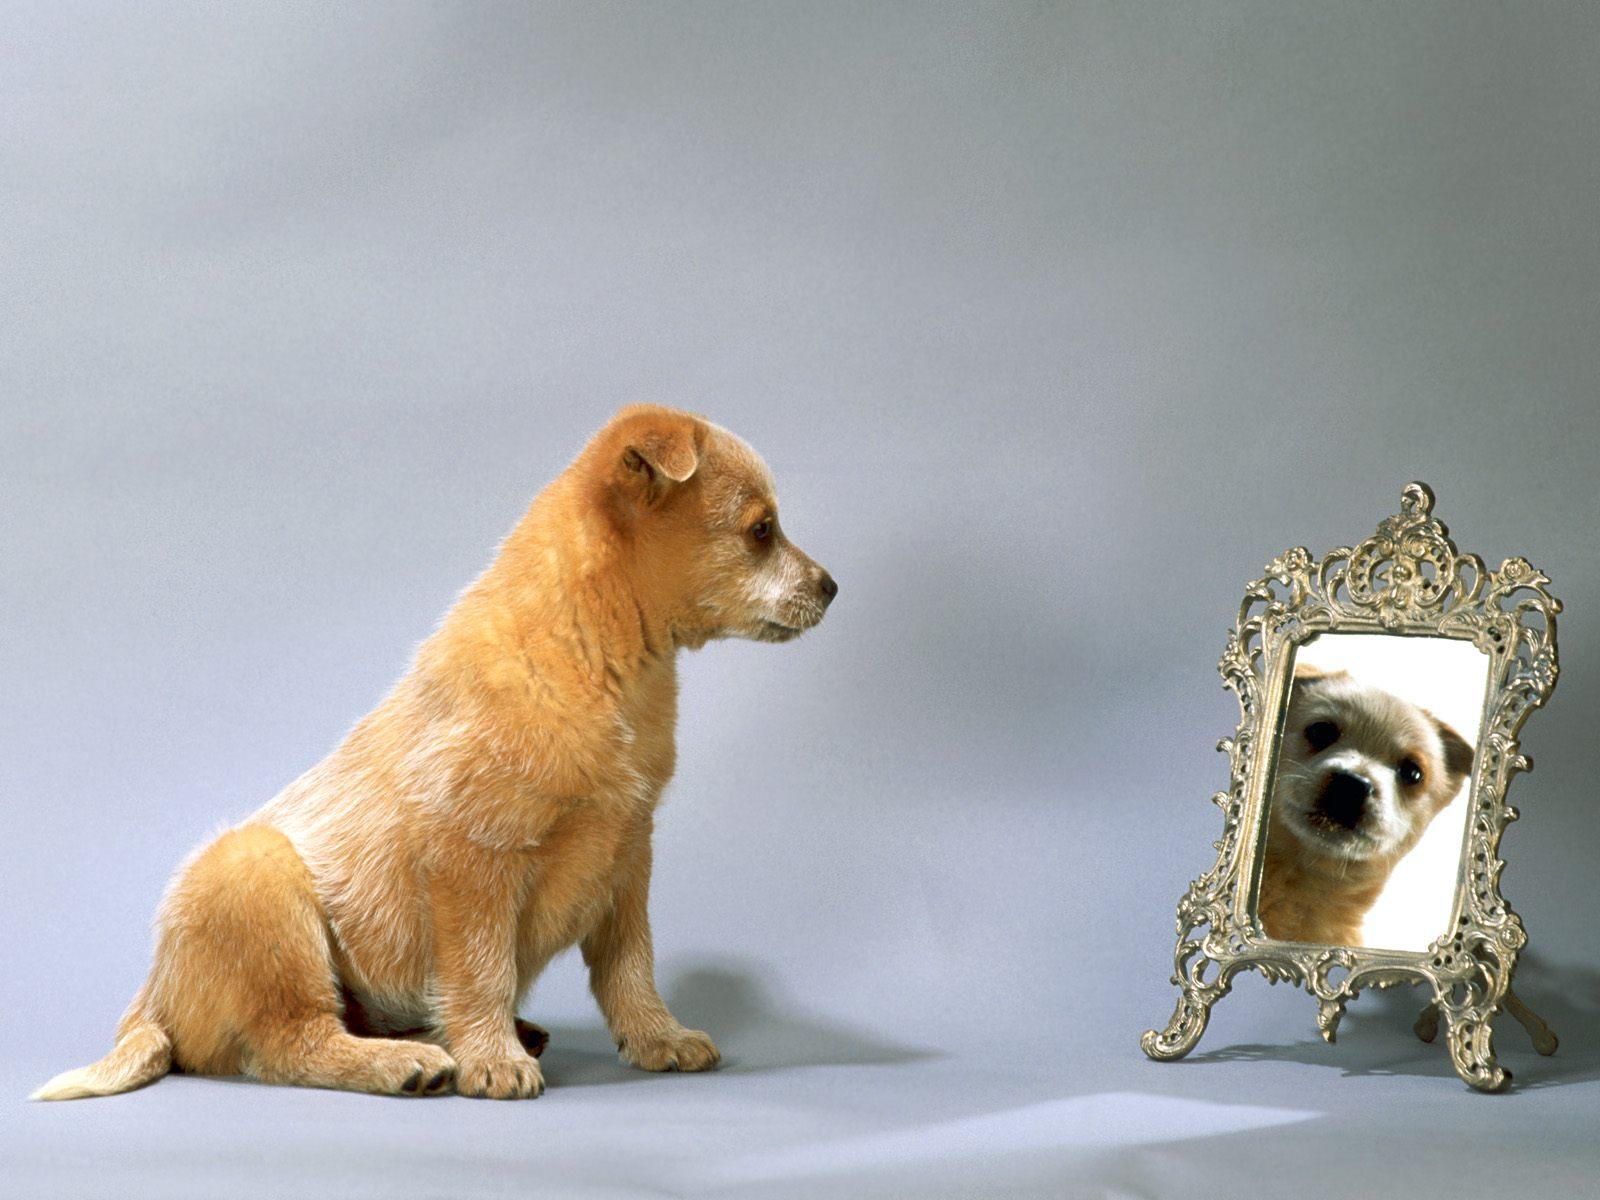 puppy wallpaper dog